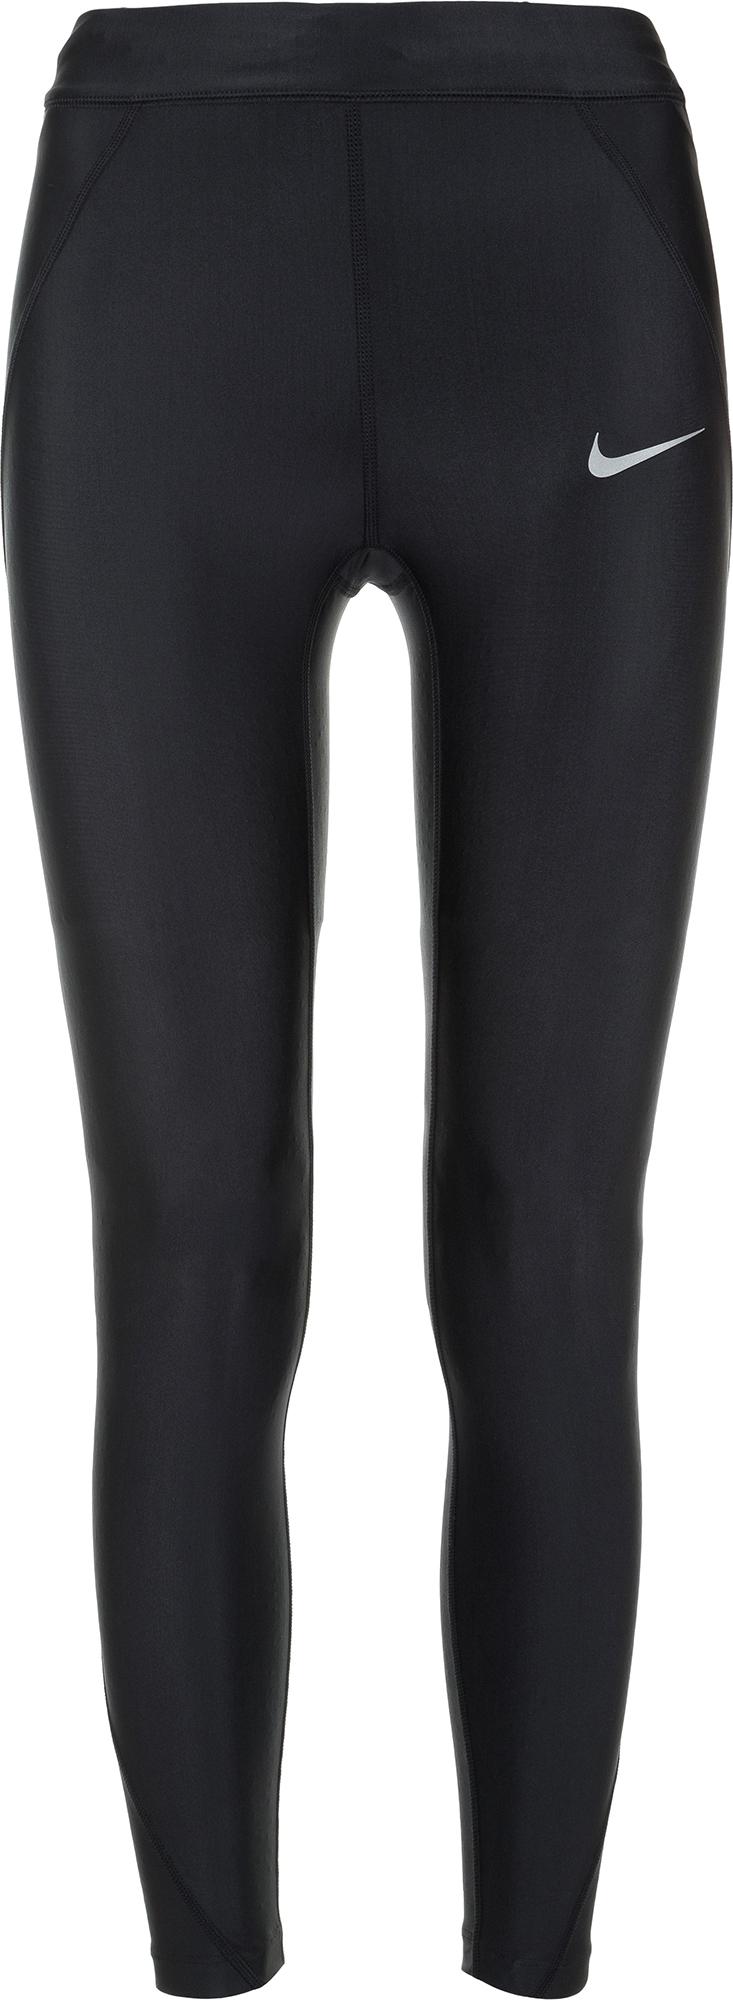 Nike Легинсы женские Nike Speed 7/8, размер 46-48 nike перчатки атлетические женские nike accessories fundamental ii размер 7 5